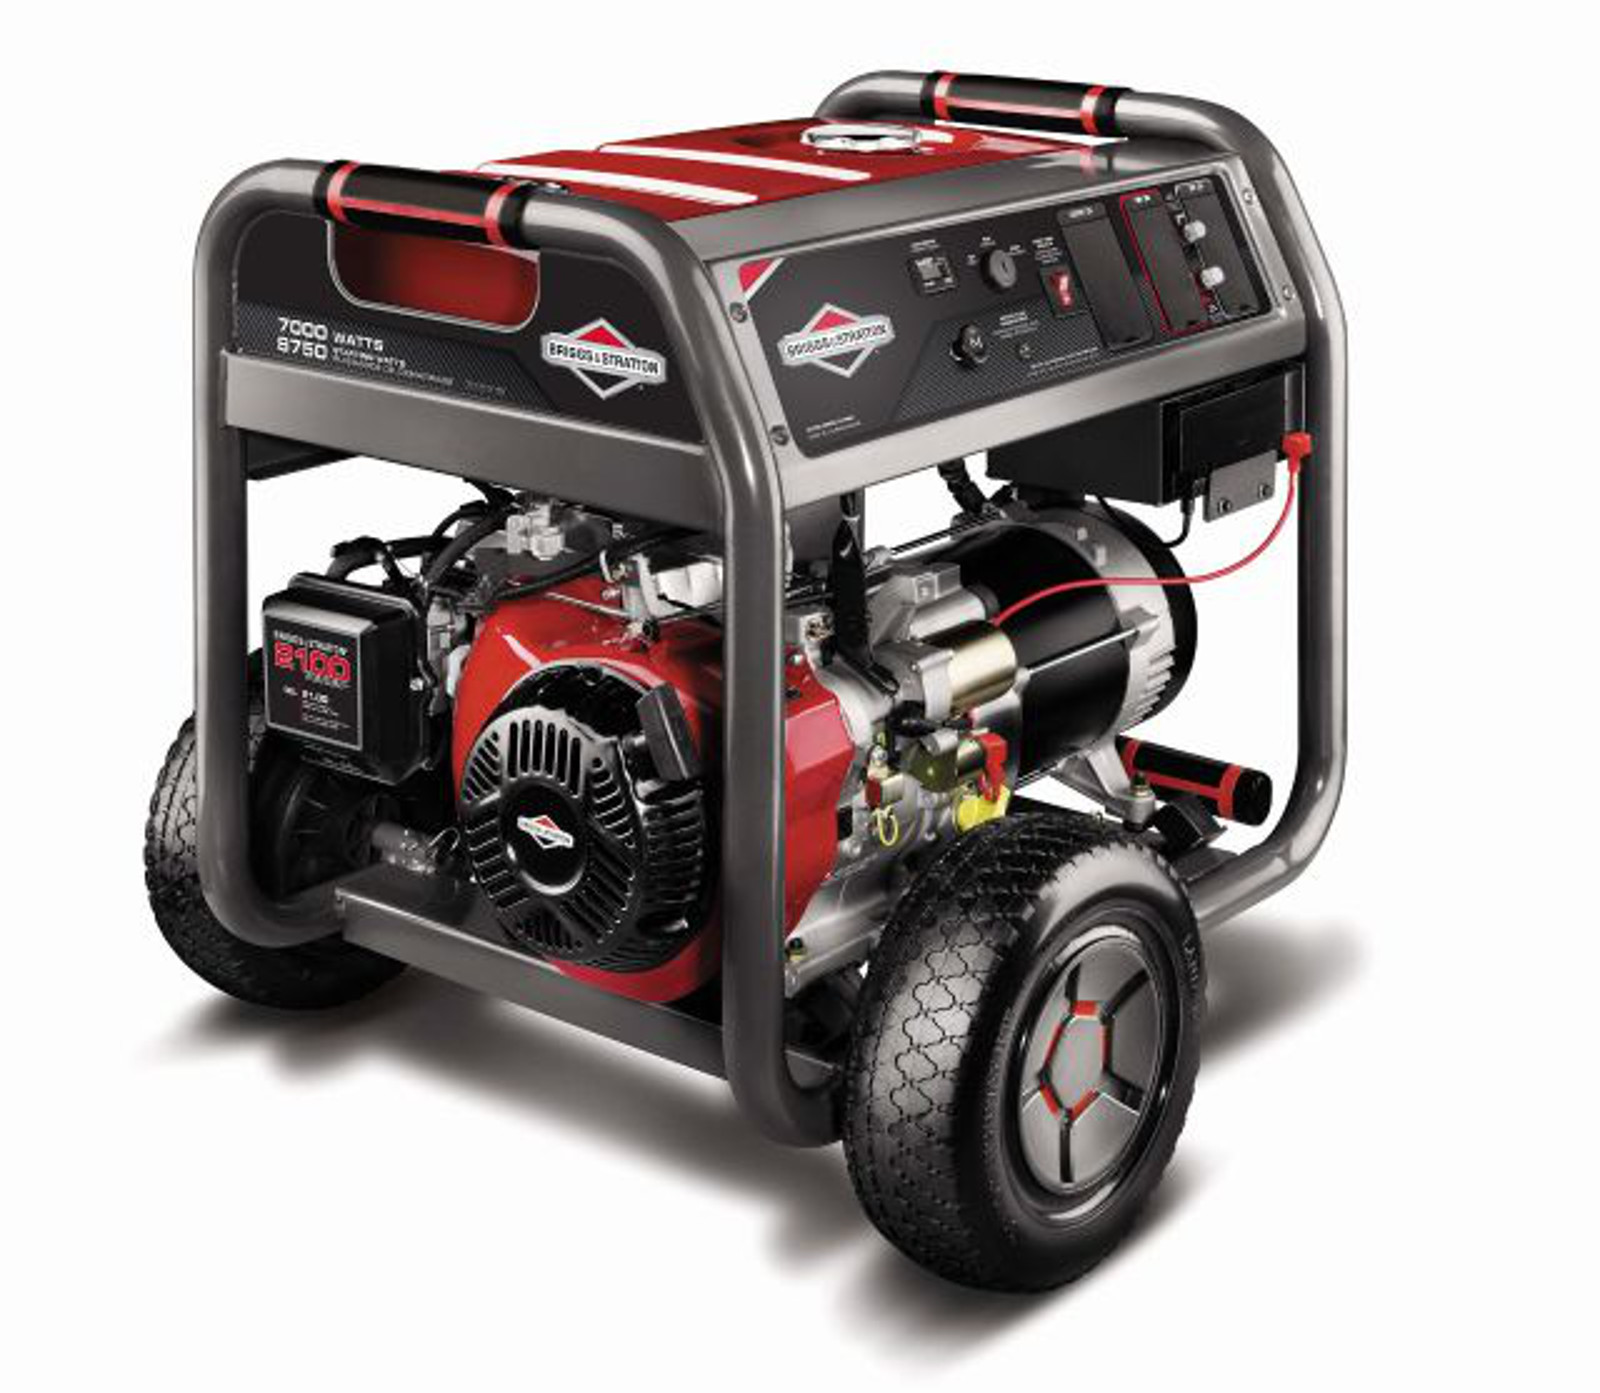 Briggs & Stratton 7000 Watt Elite Series™ Portable Generator